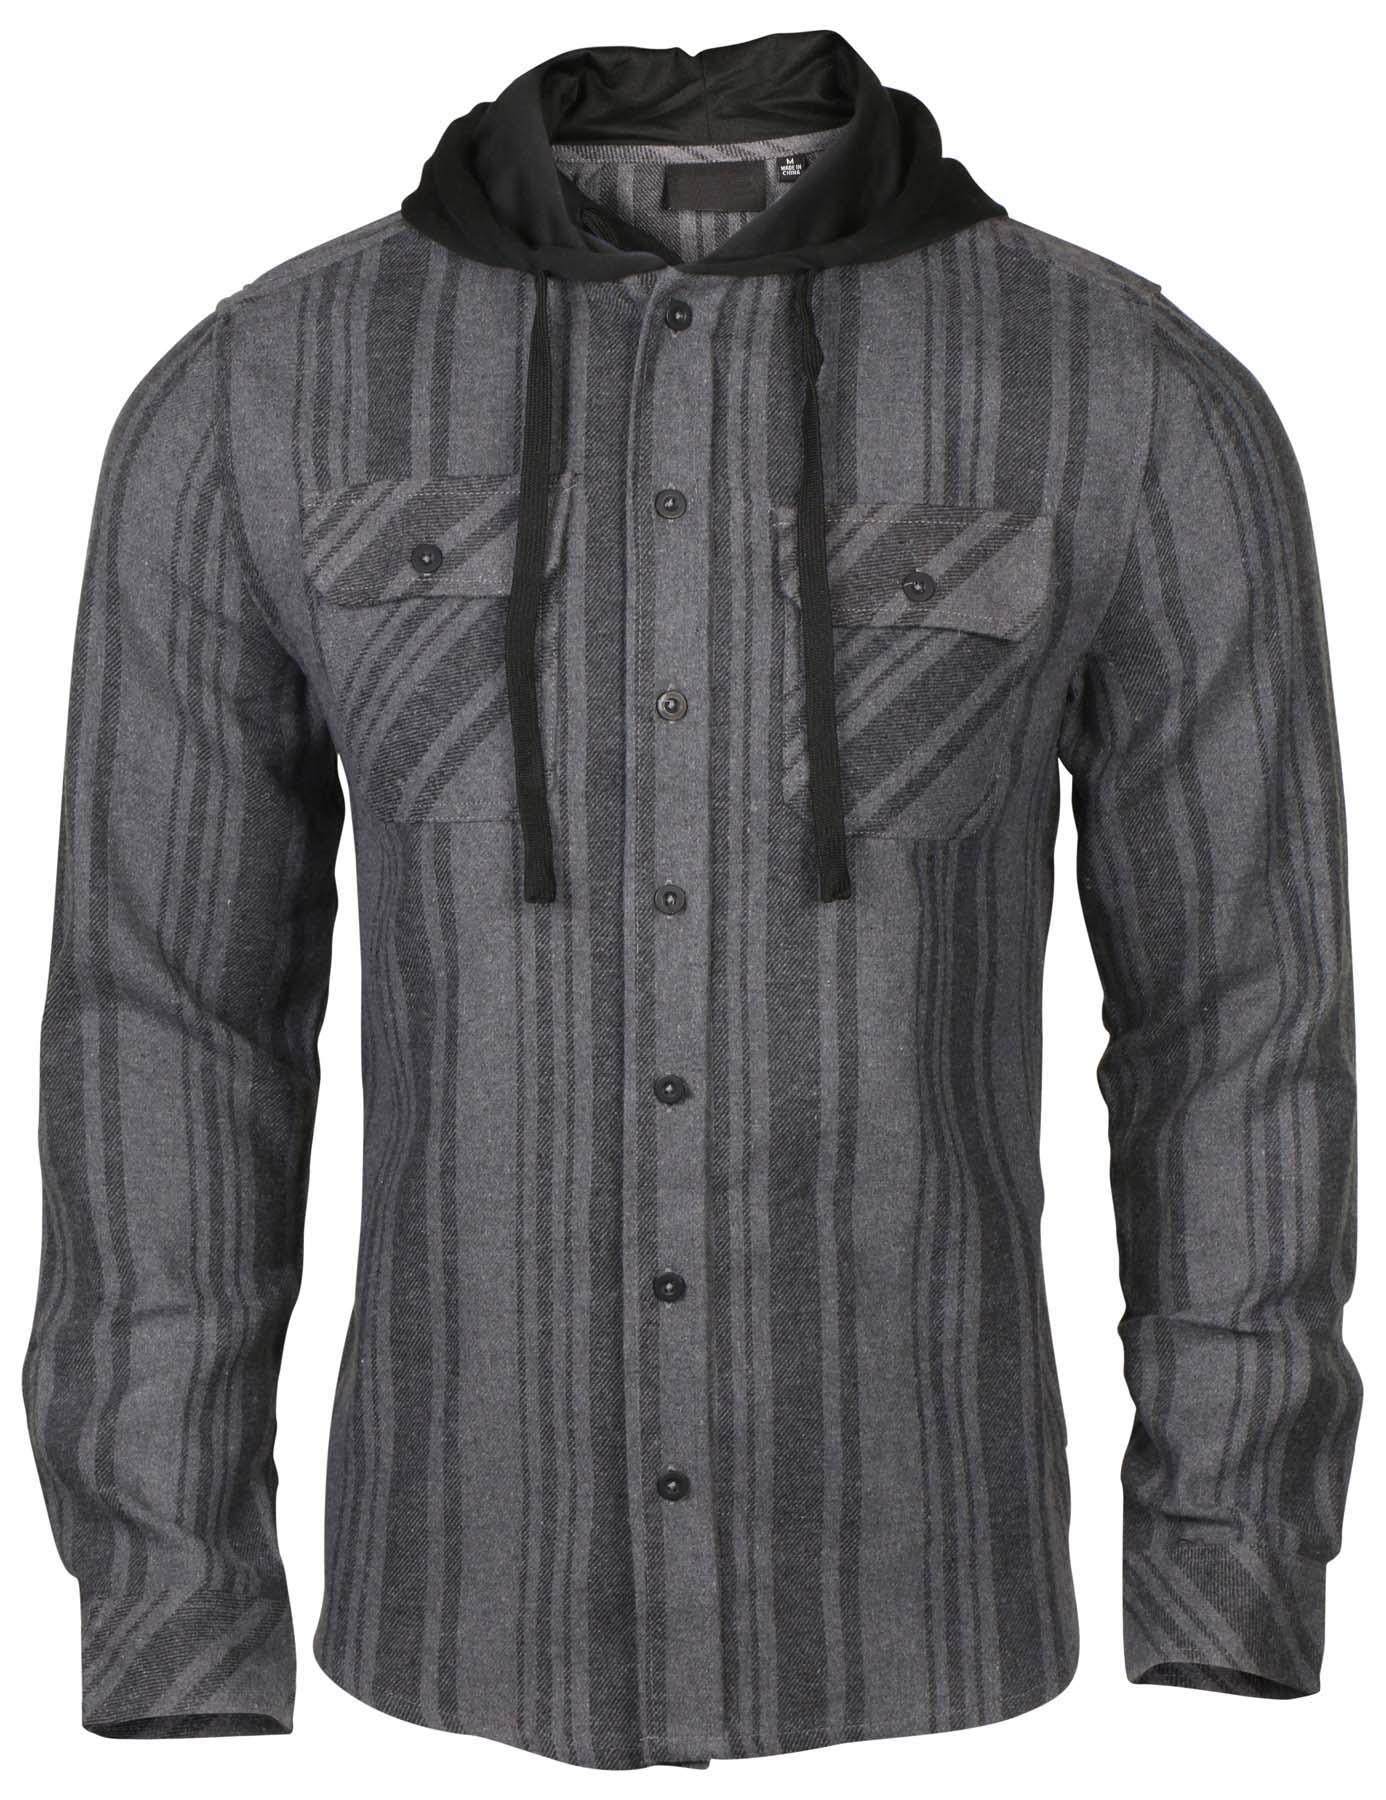 9 crowns men 39 s lightweight hoodie plaid flannel shirt ebay for 9 oz flannel shirt